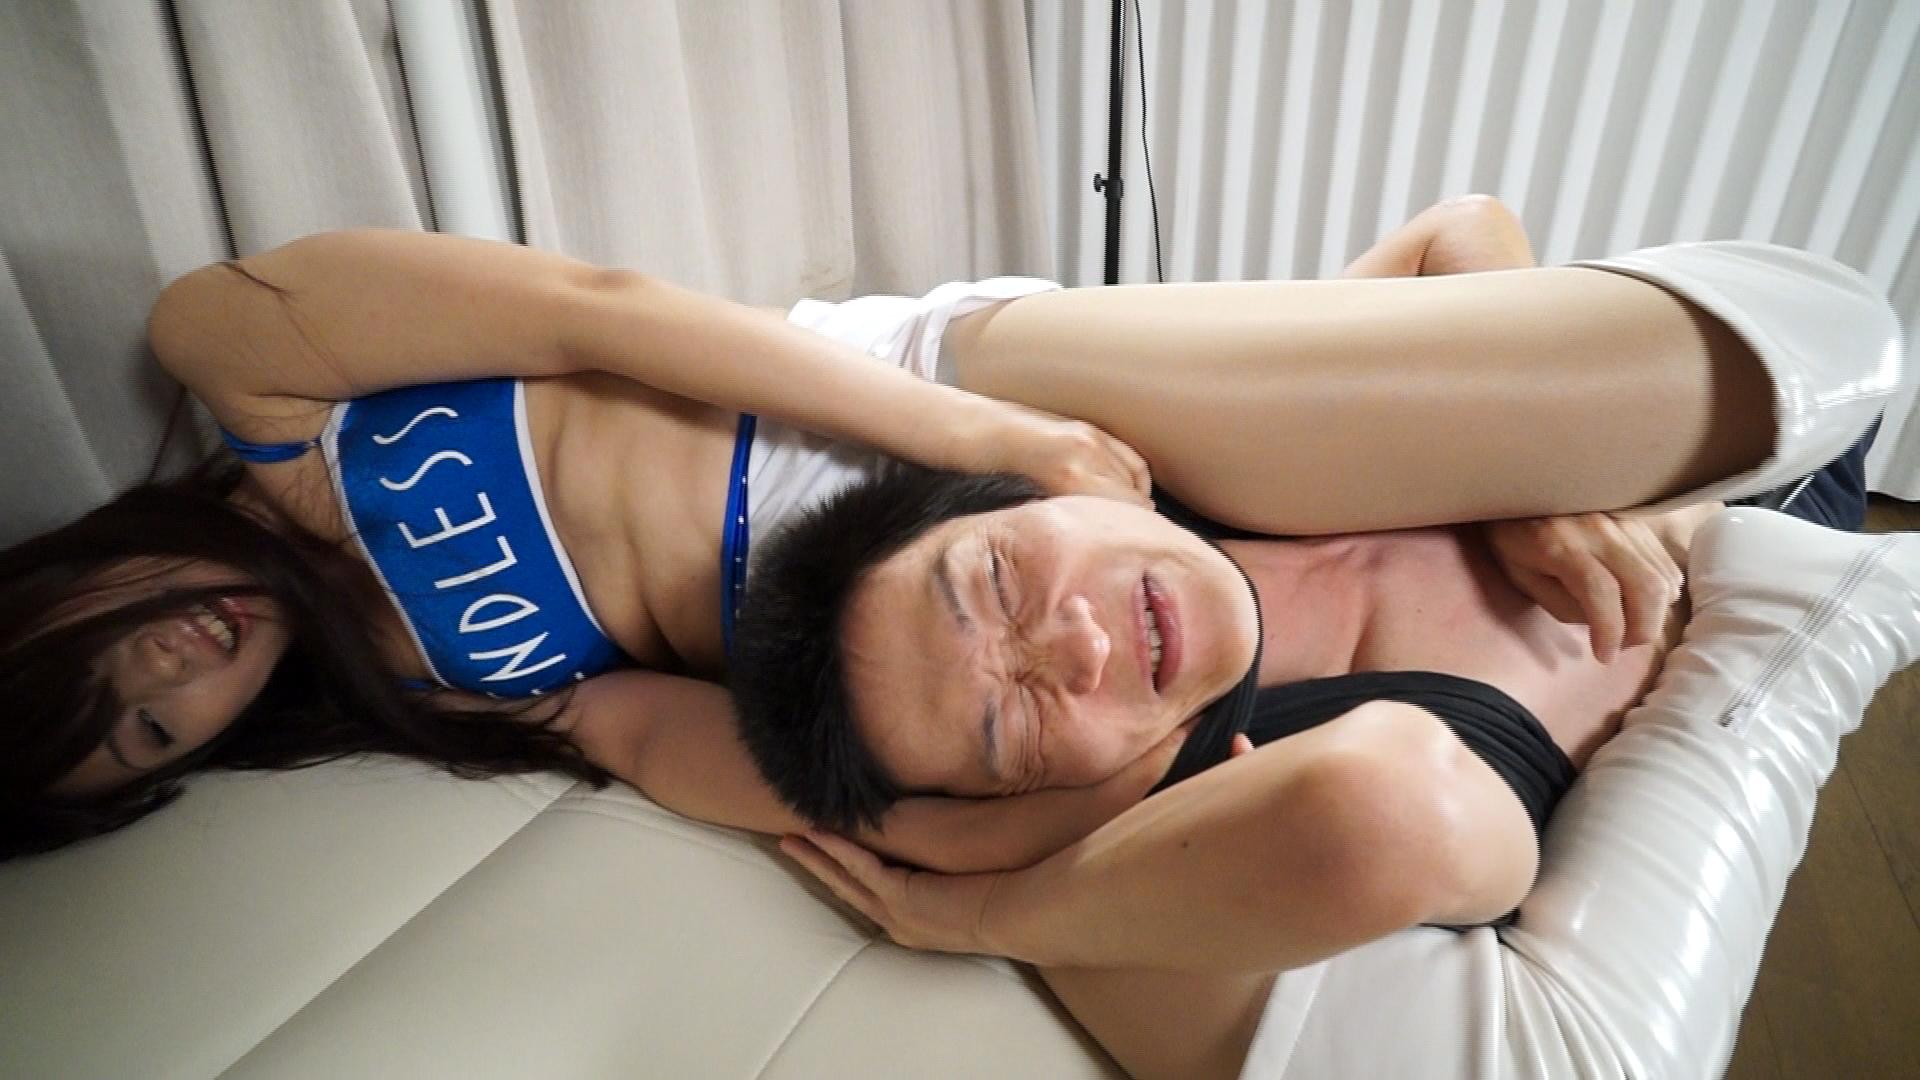 【HD】181cm超越高身長女の理不尽男制裁粛清ドミ サンプル画像08